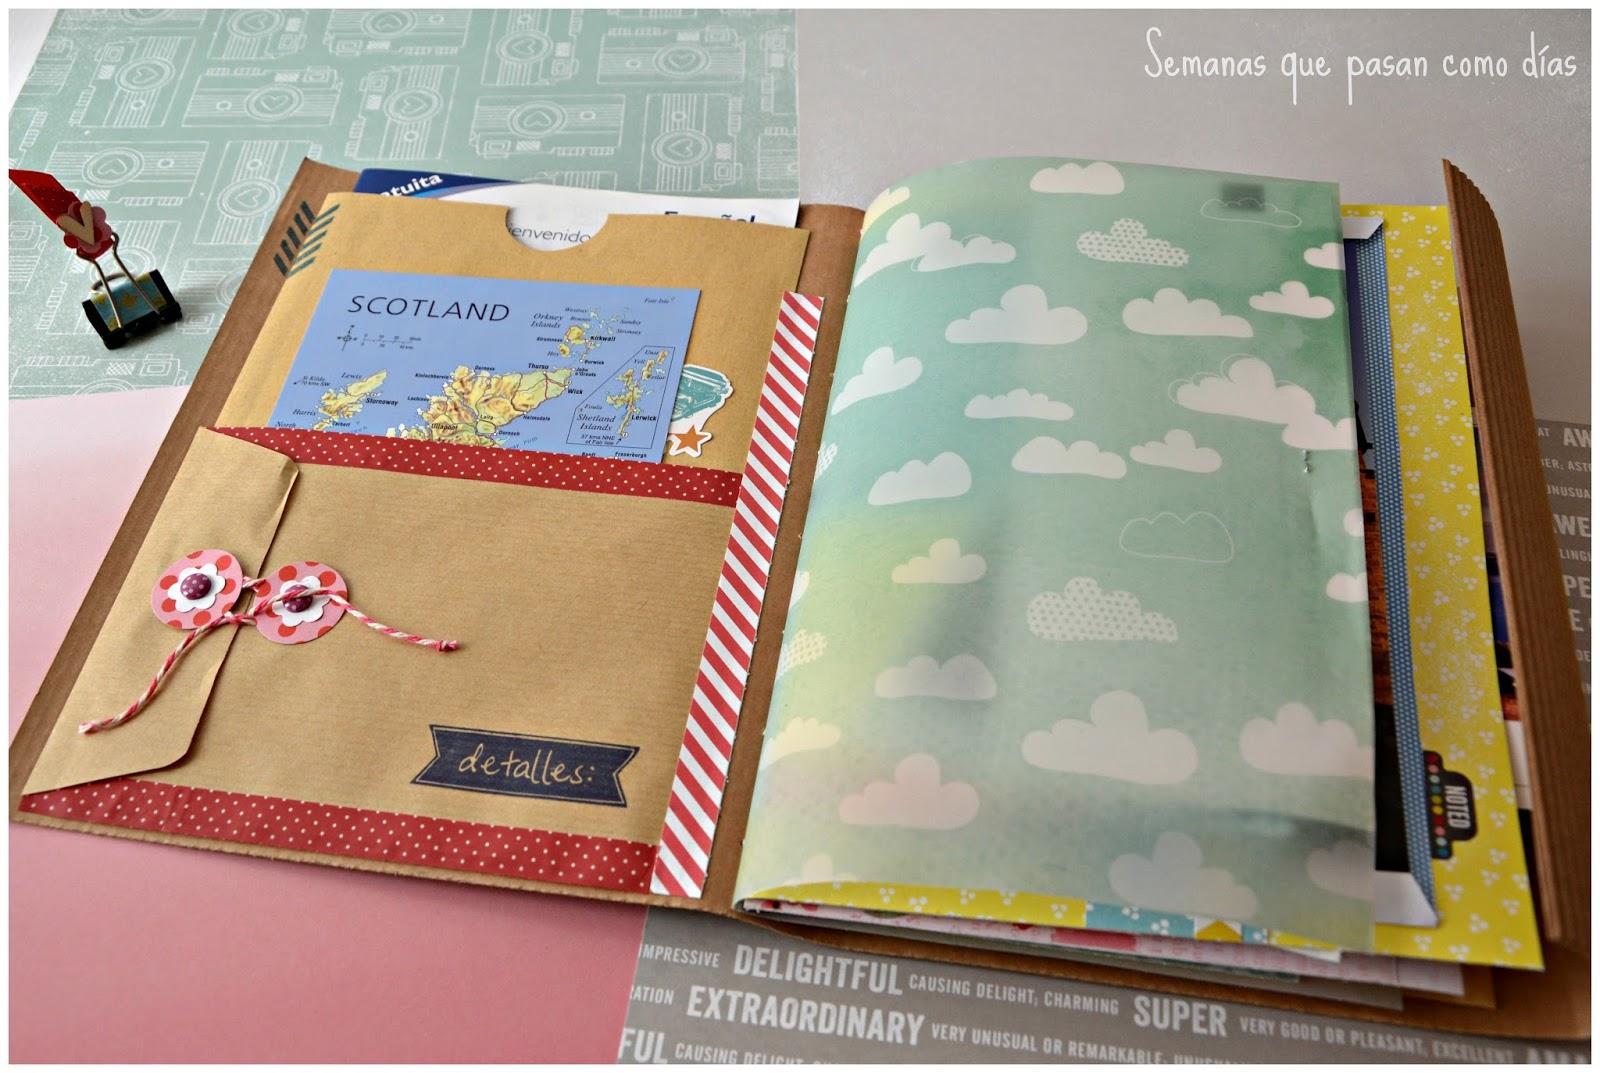 Semanas que pasan como d as viaje a escocia cuaderno lbum de viaje - Decoracion de album de fotos ...